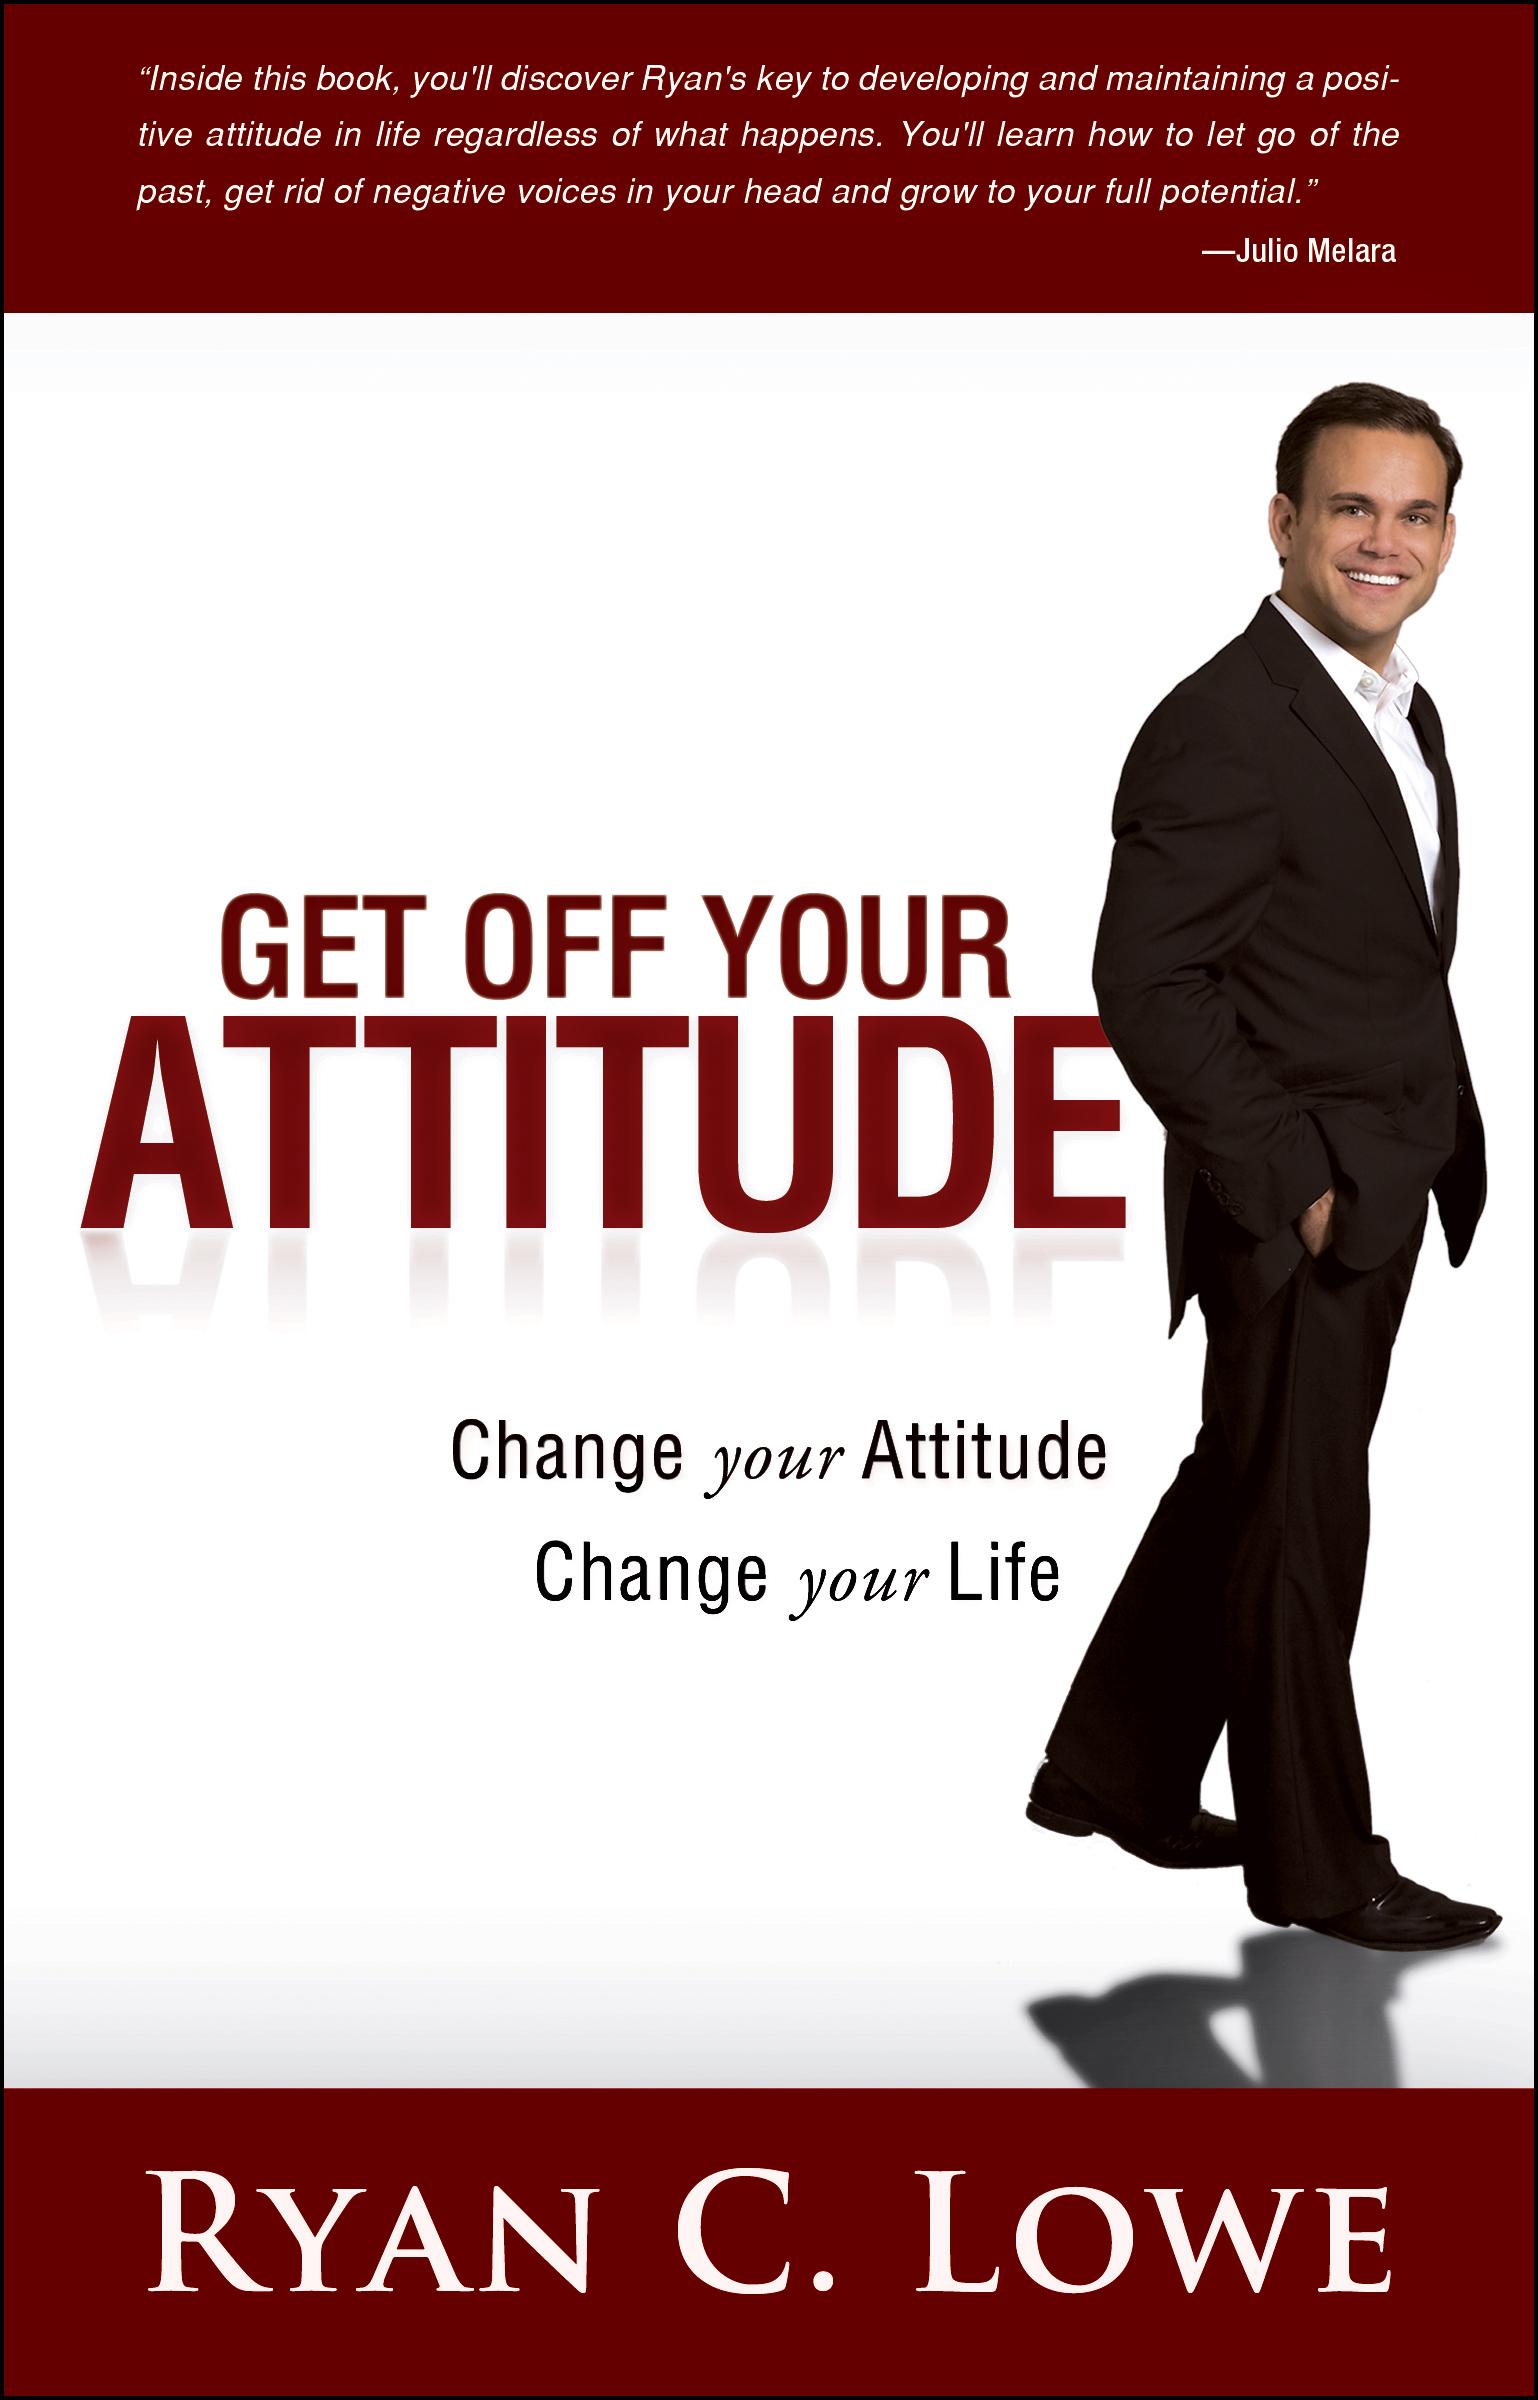 Get Off Your Attitude - Ryan C. Lowe